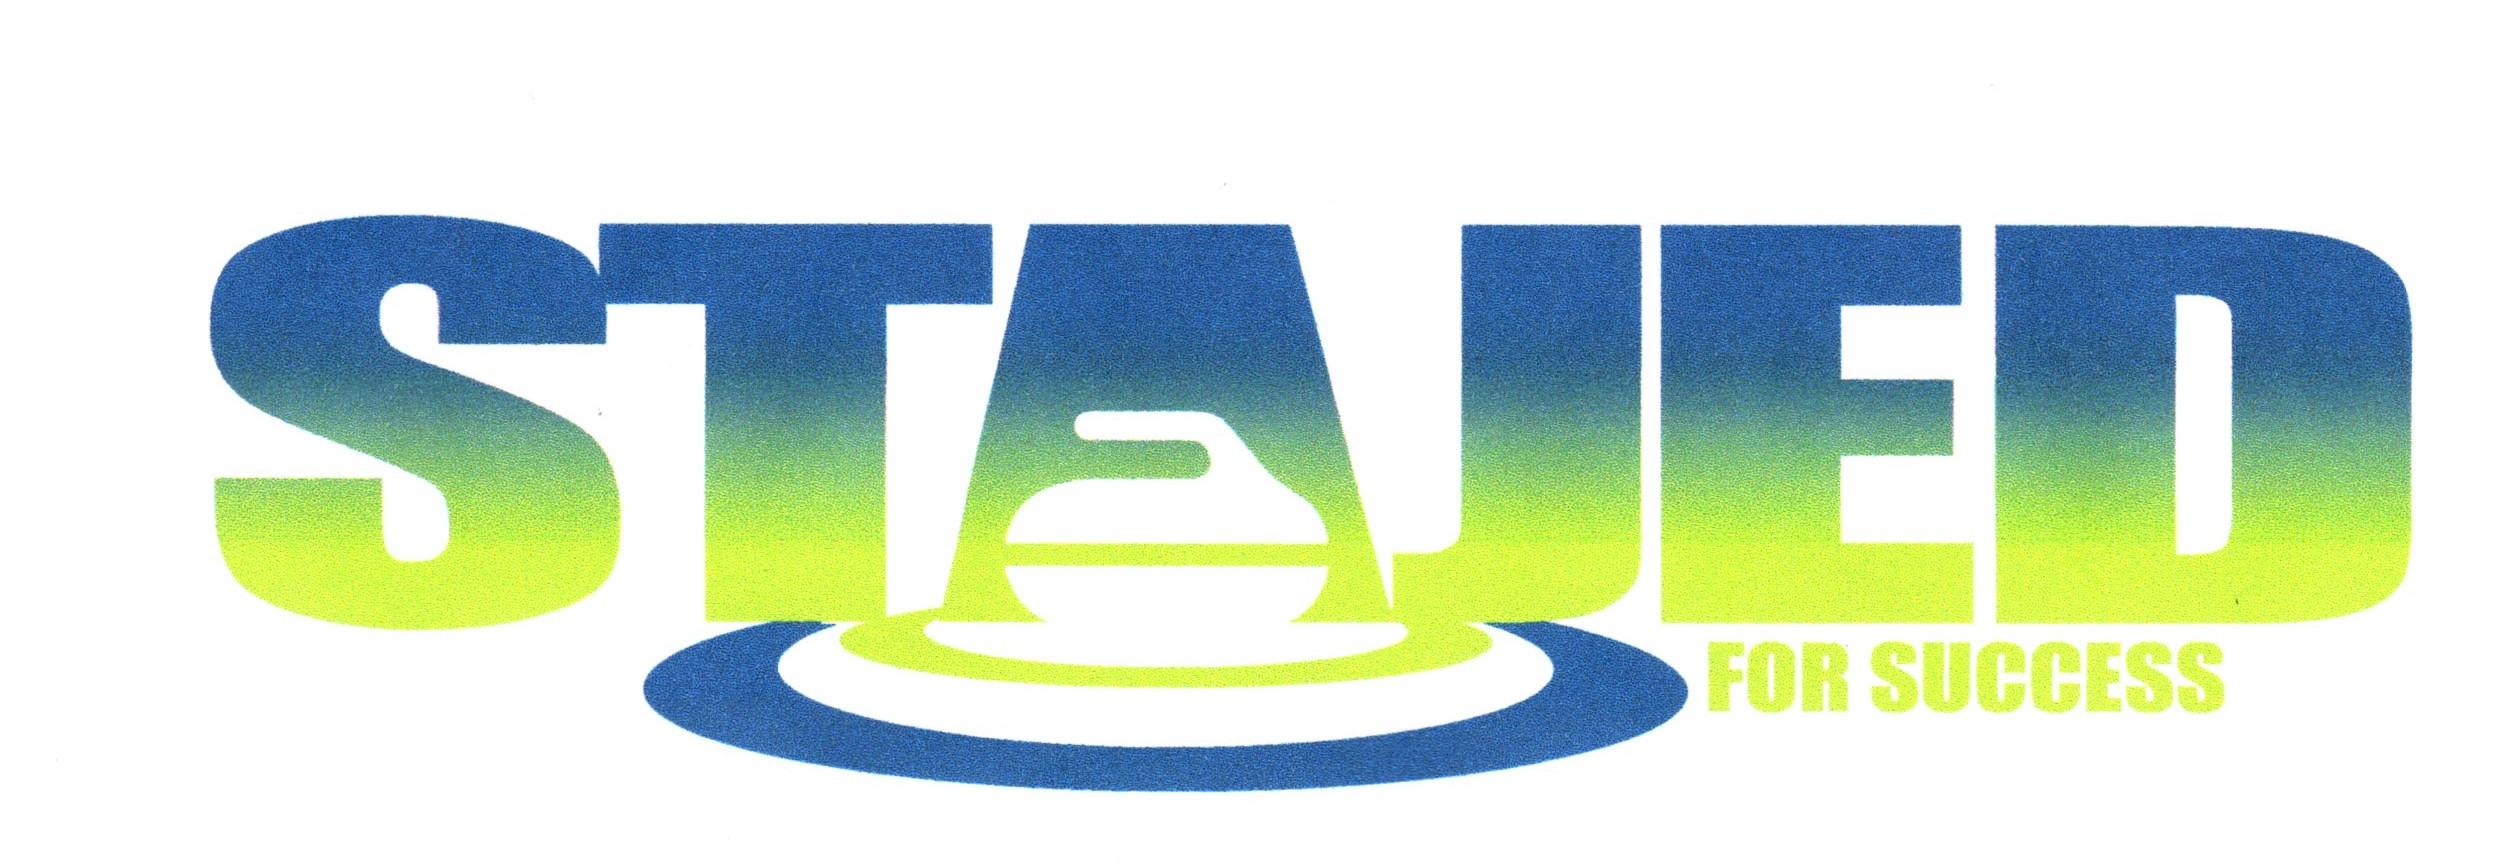 STAJED Logo20190524 11175828